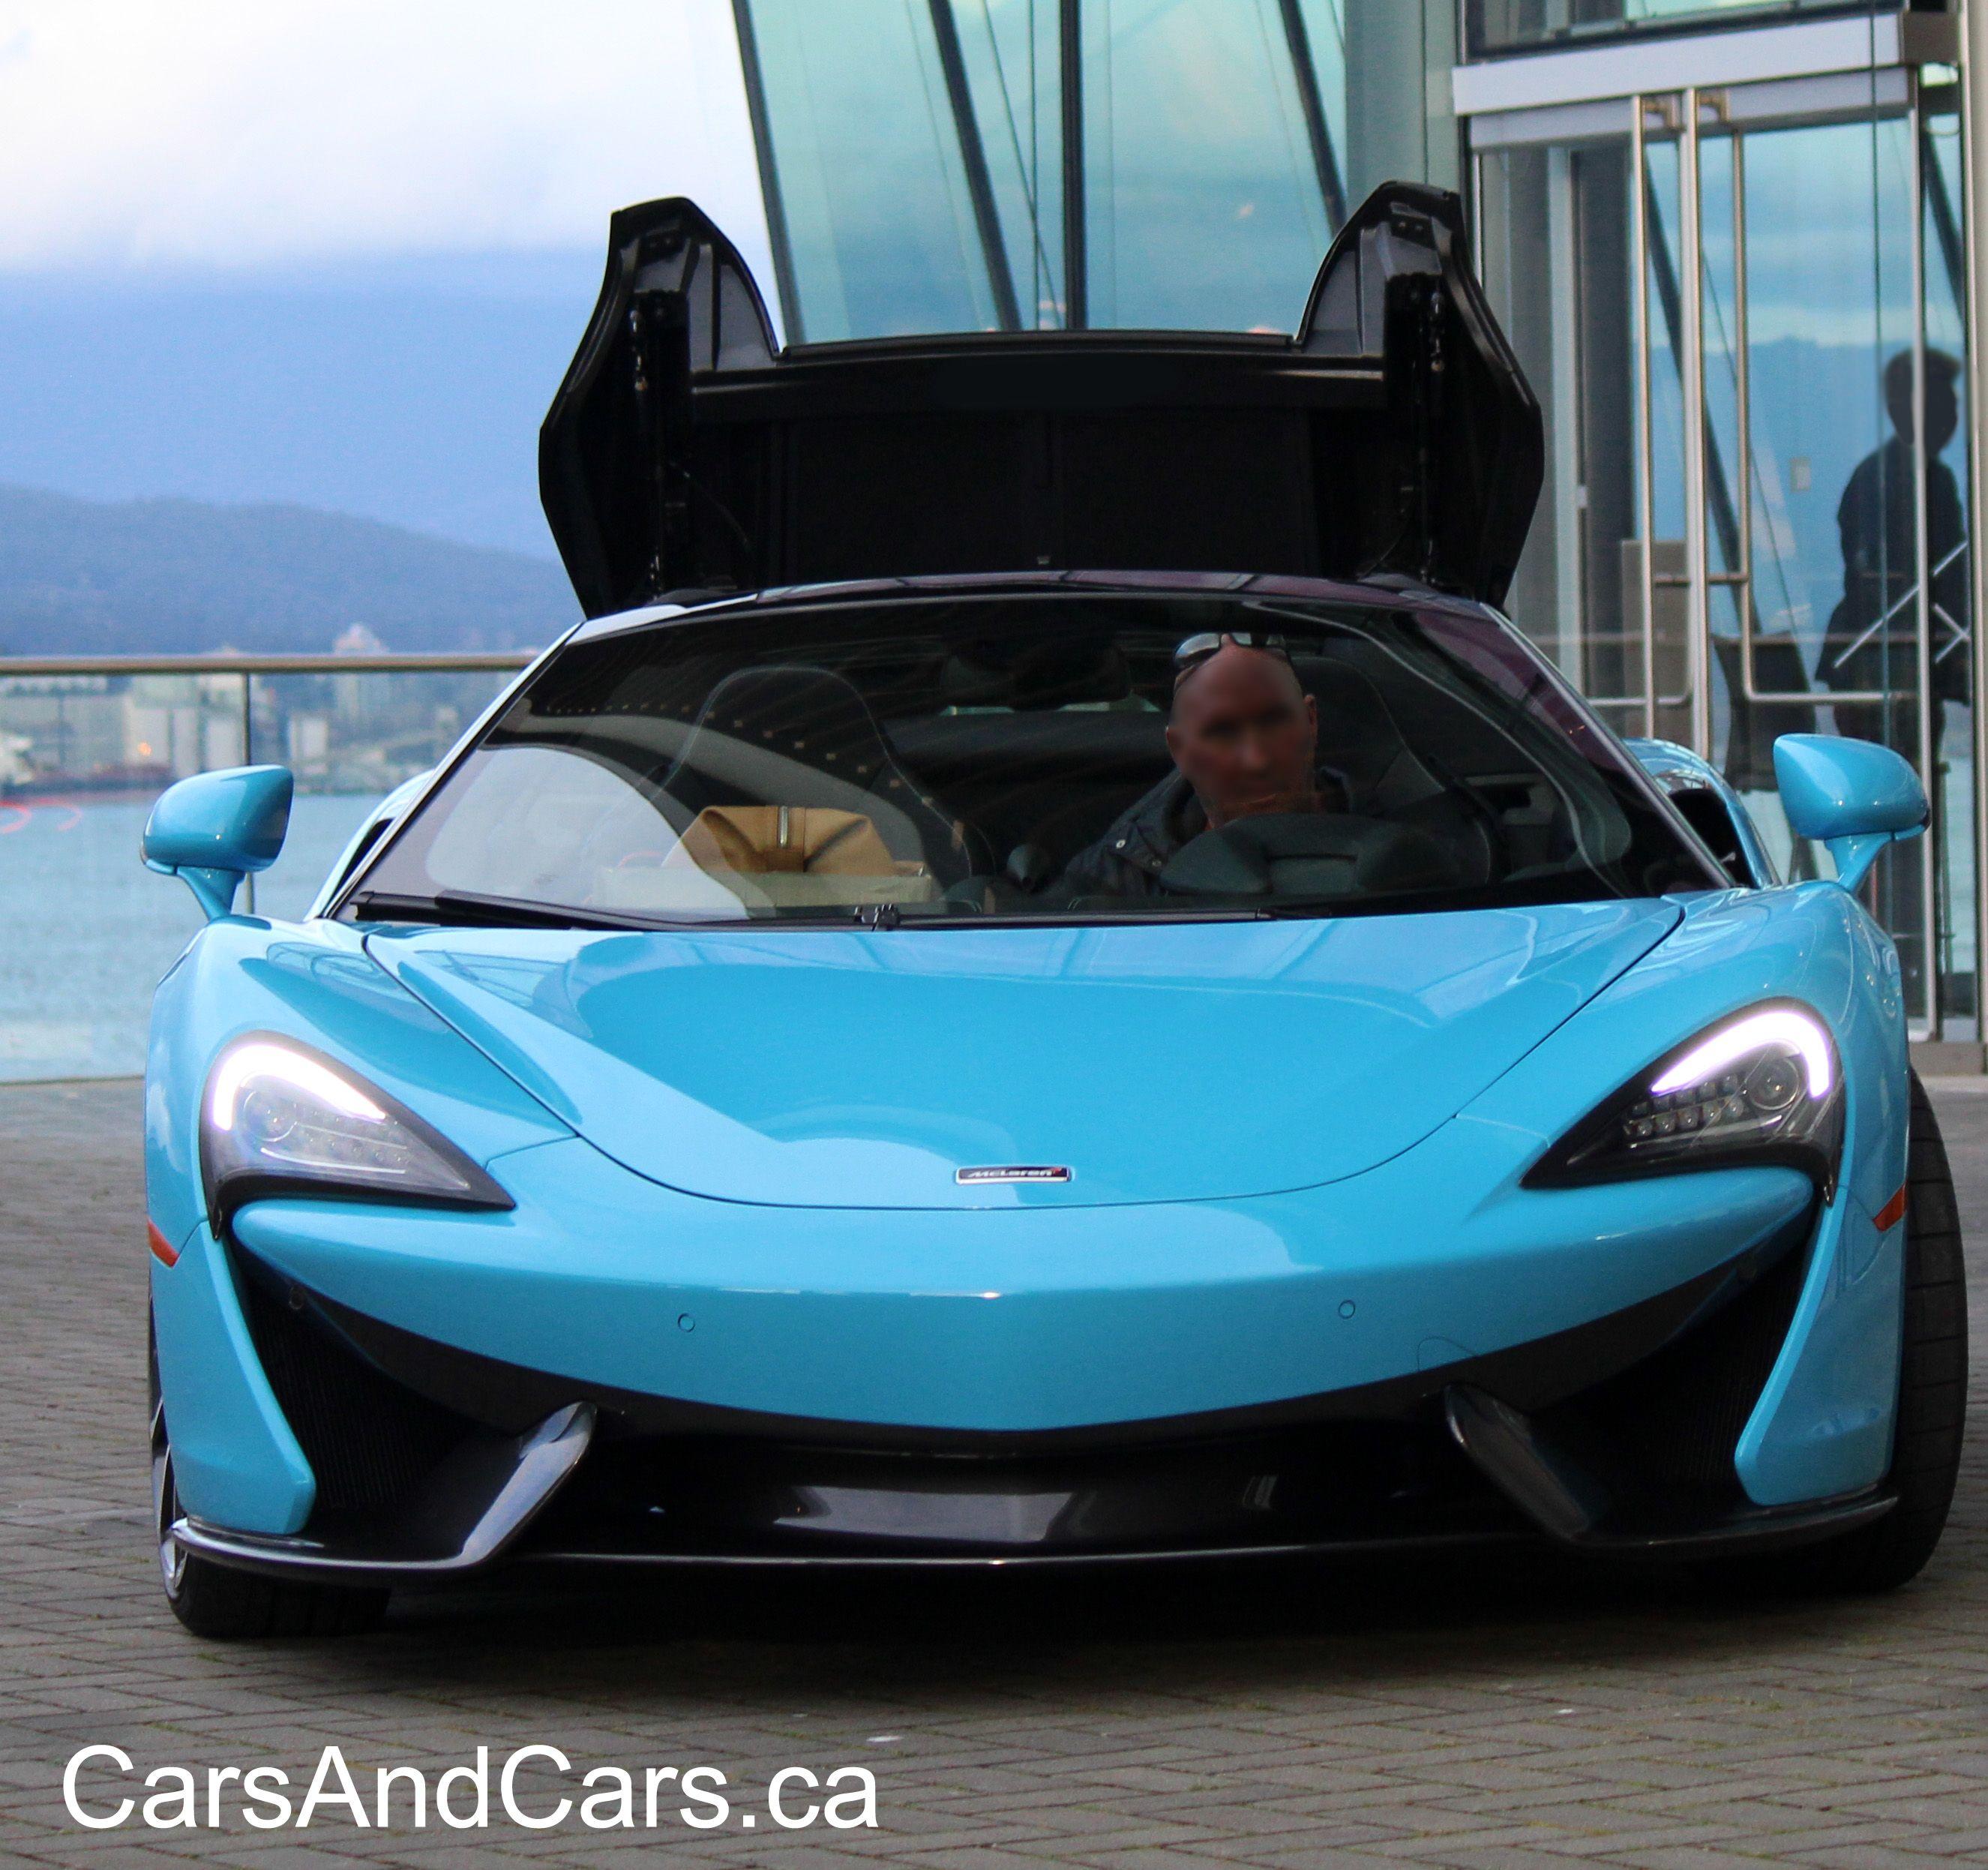 McLaren 570S Spider In Curacao Blue #SuperCar #SportCar